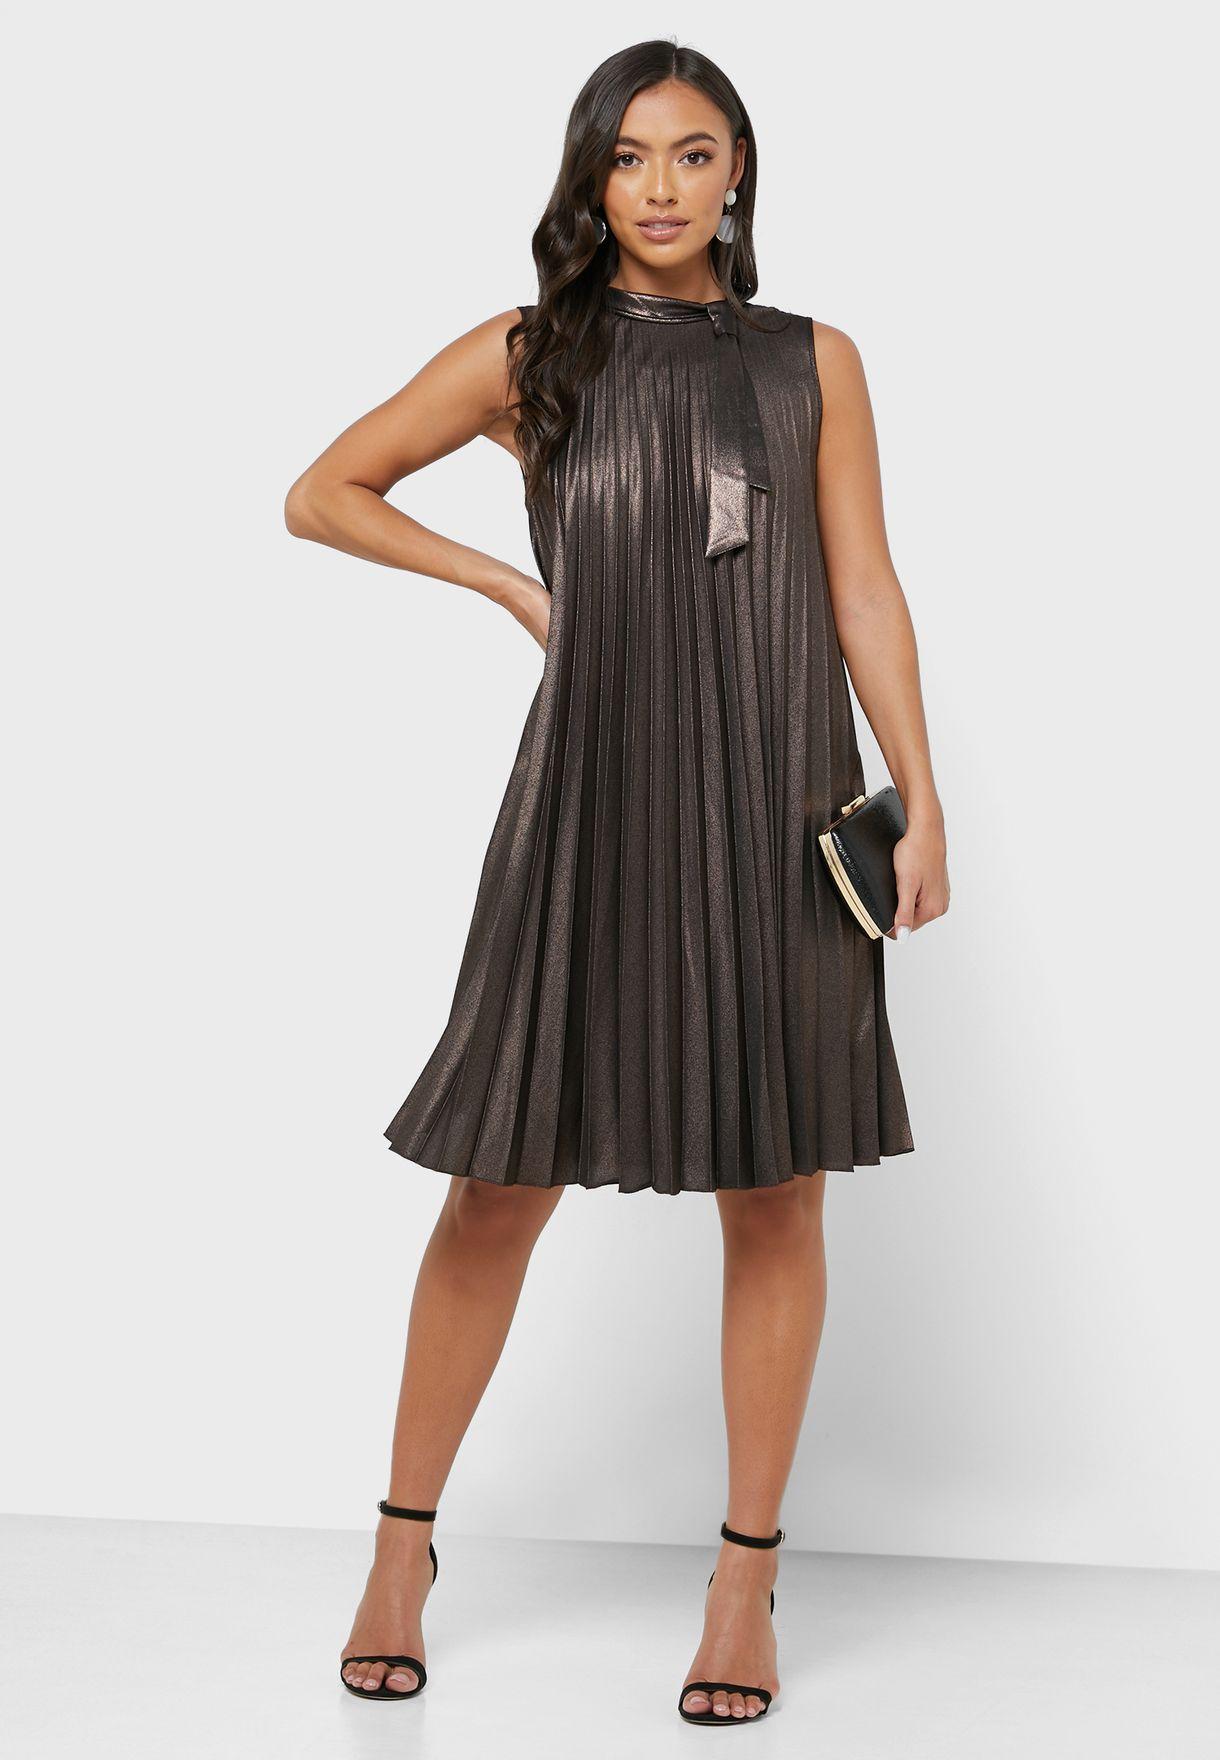 Tie Neck Metallic Pleated Dress